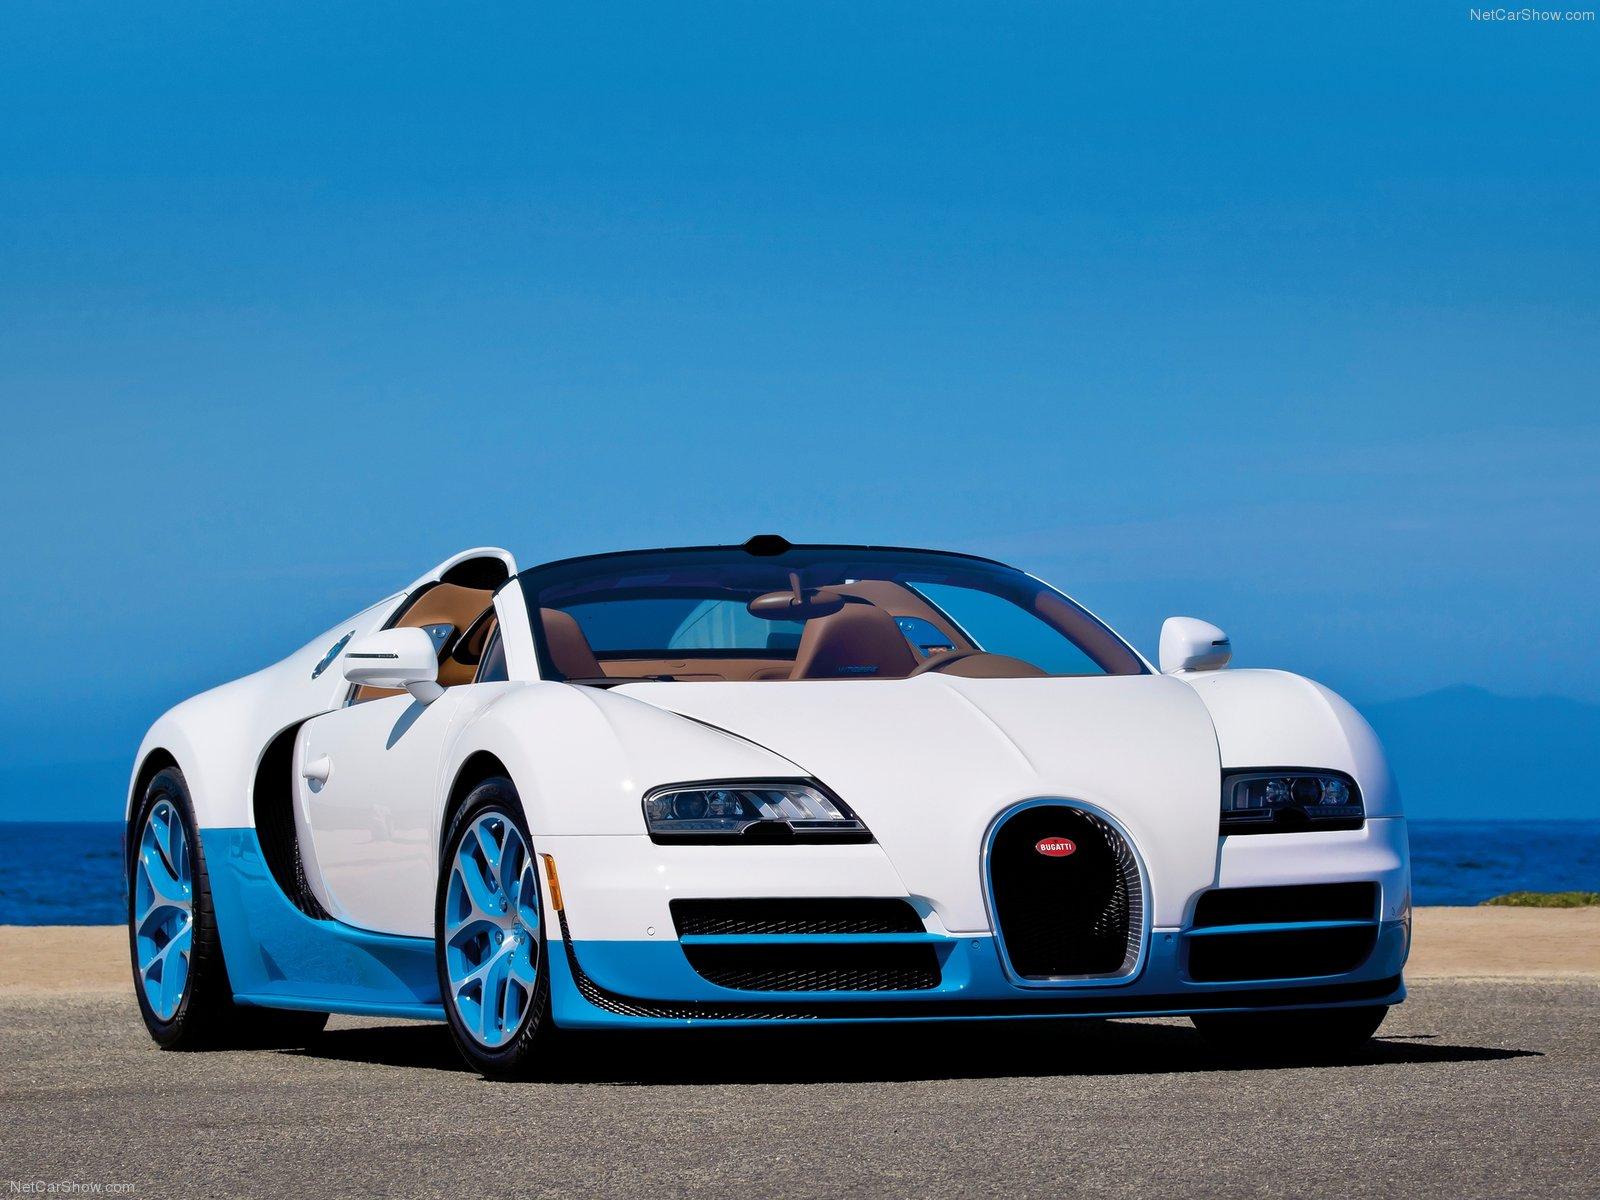 rastar-118-bugatti-veyron-grand-sport-vitesse Stunning Bugatti Veyron 16.4 Grand Sport Vitesse Interior Cars Trend